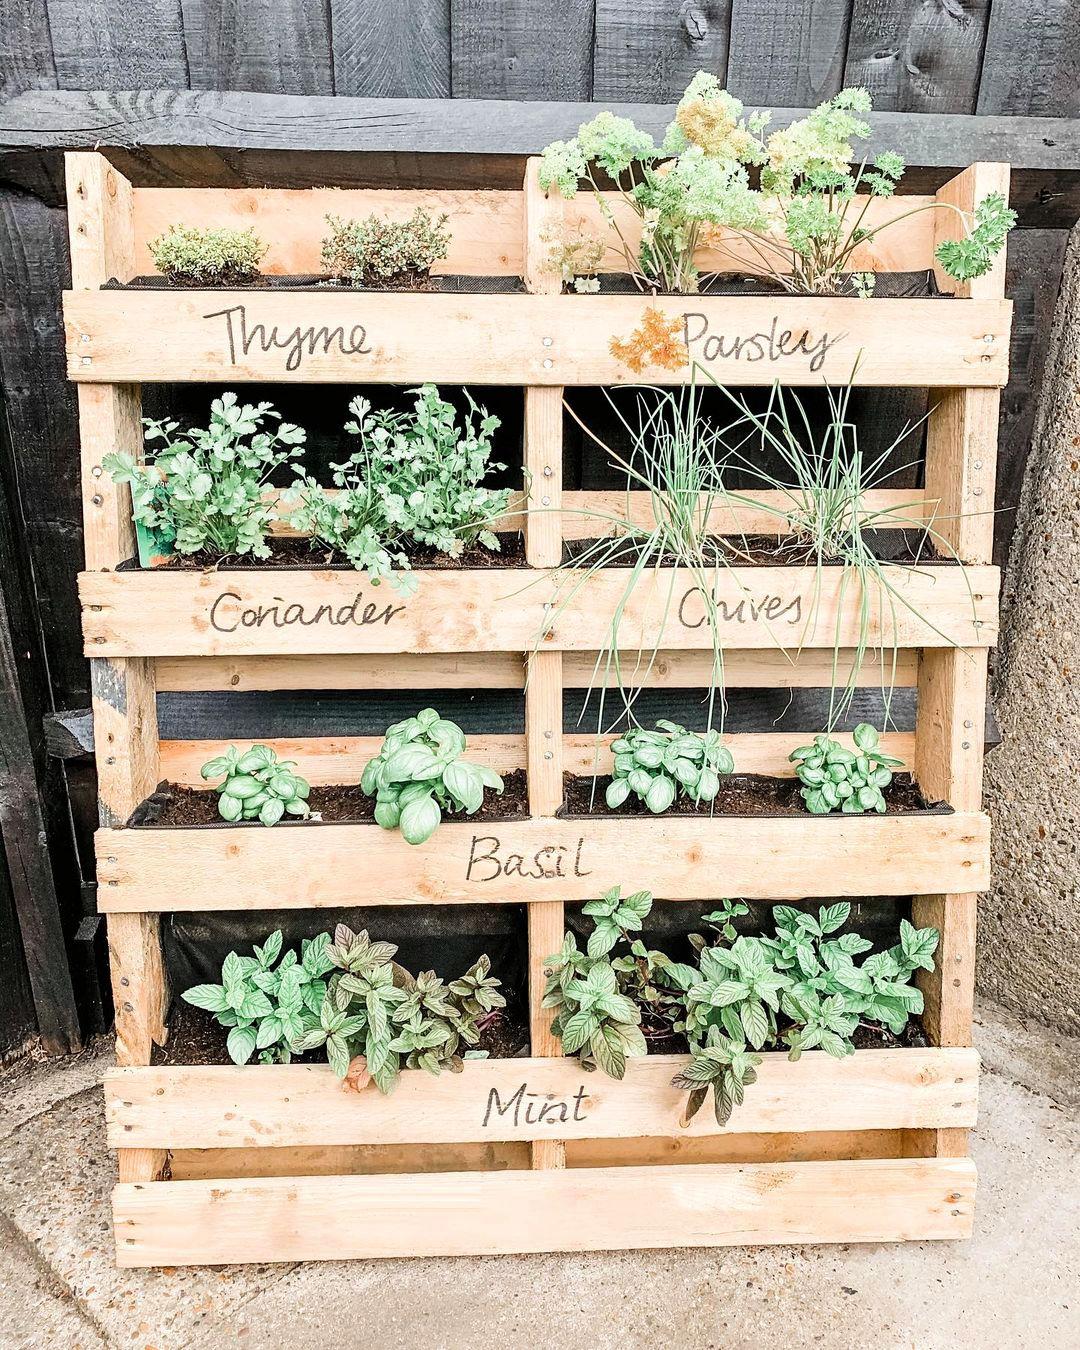 My little pallet herb garden smells lovely